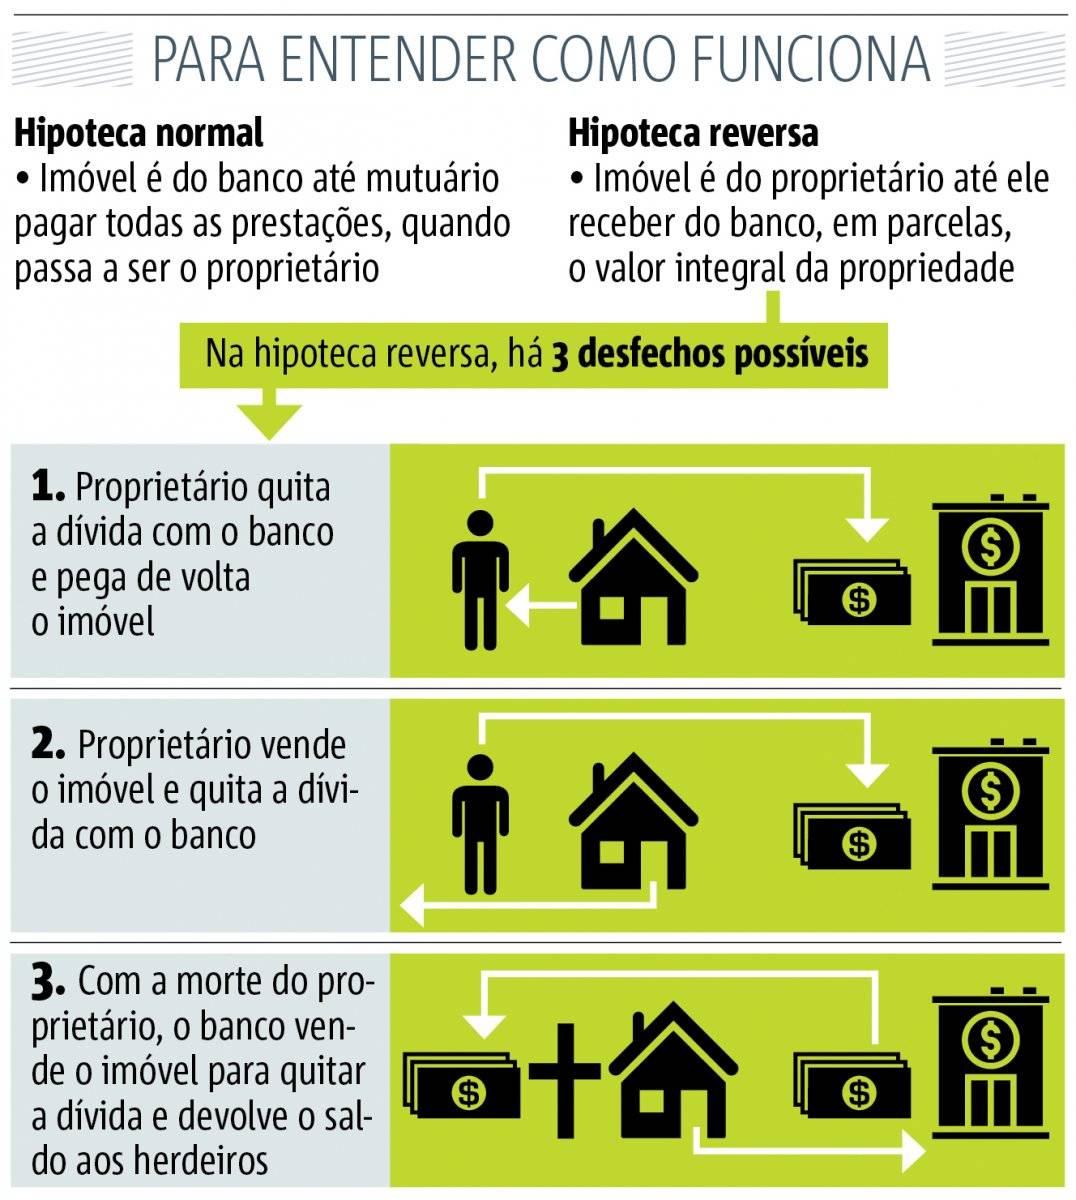 hipoteca reversa